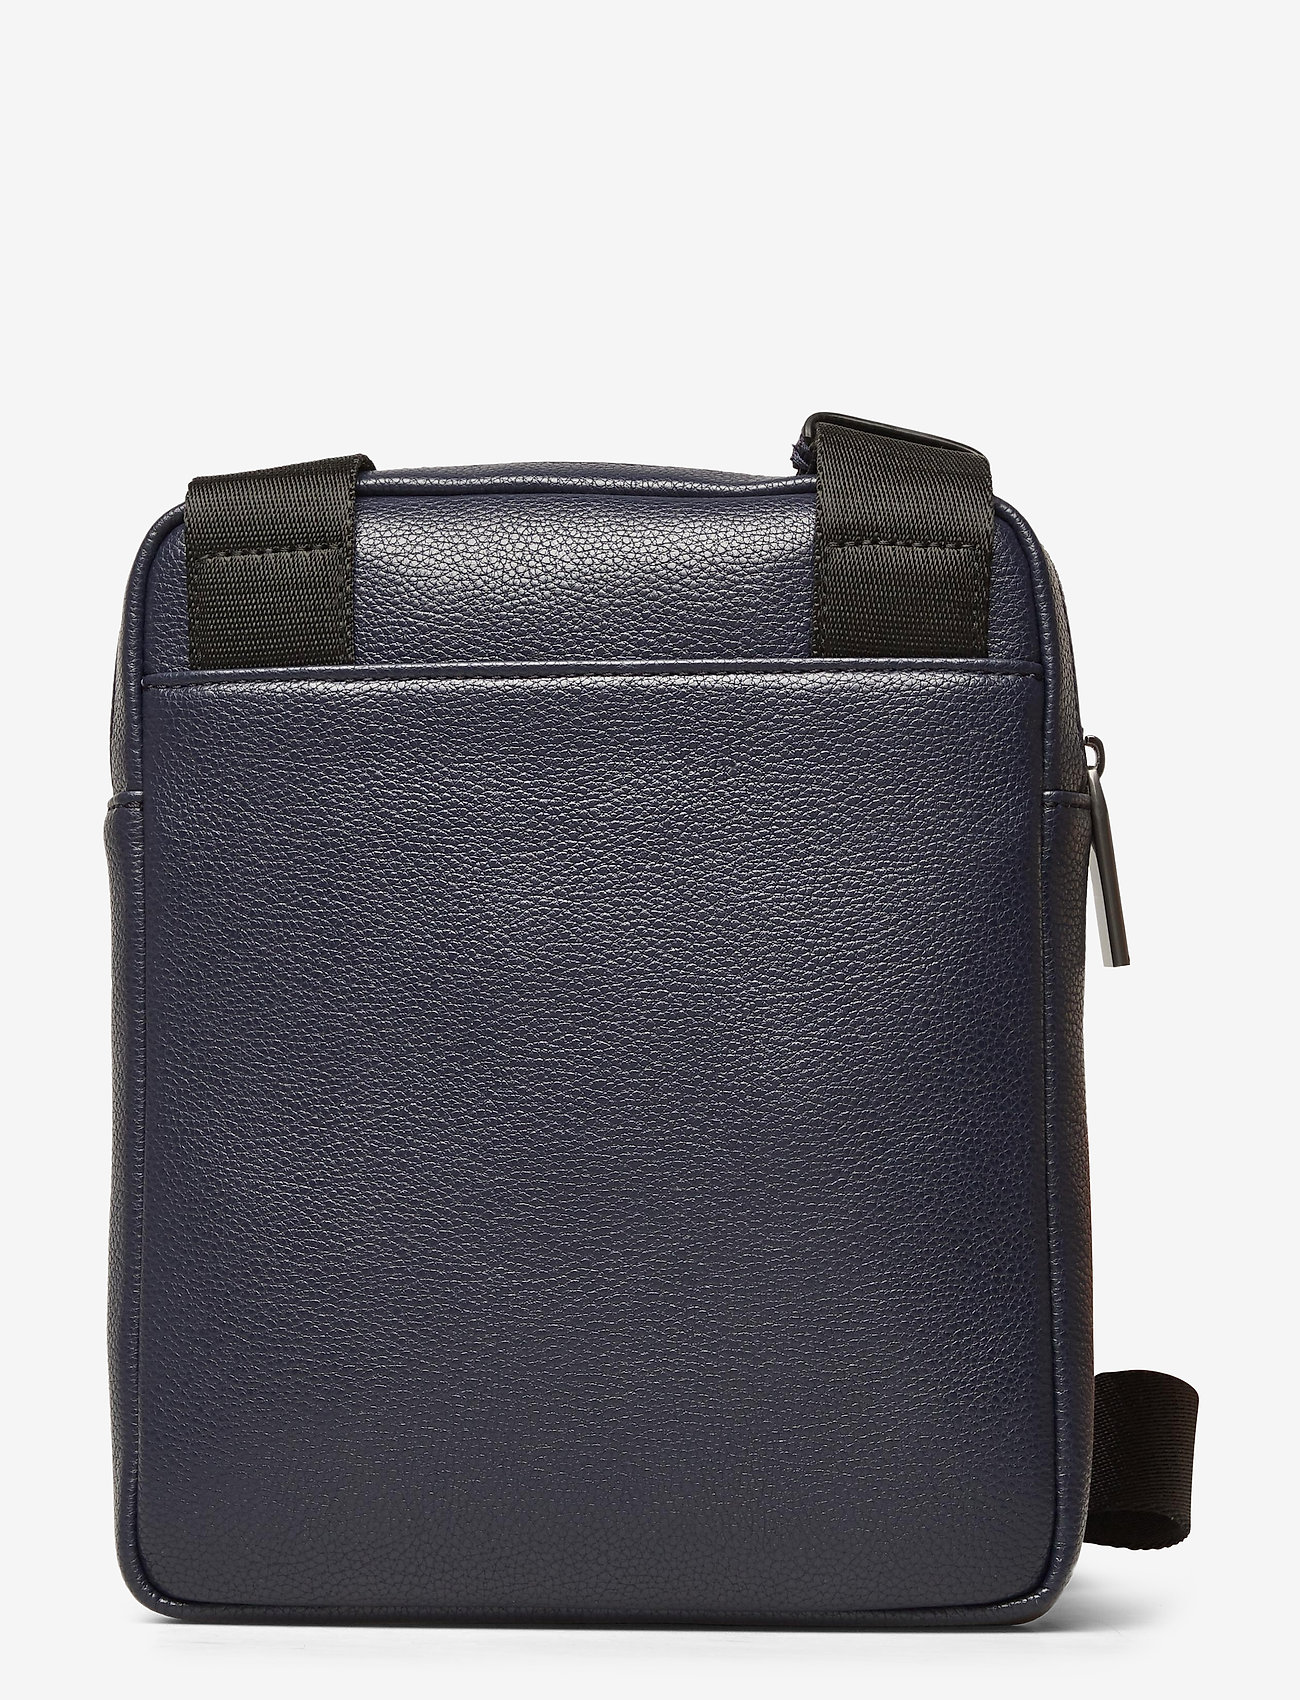 Calvin Klein Ck Bombe' Flat Cross - Bags